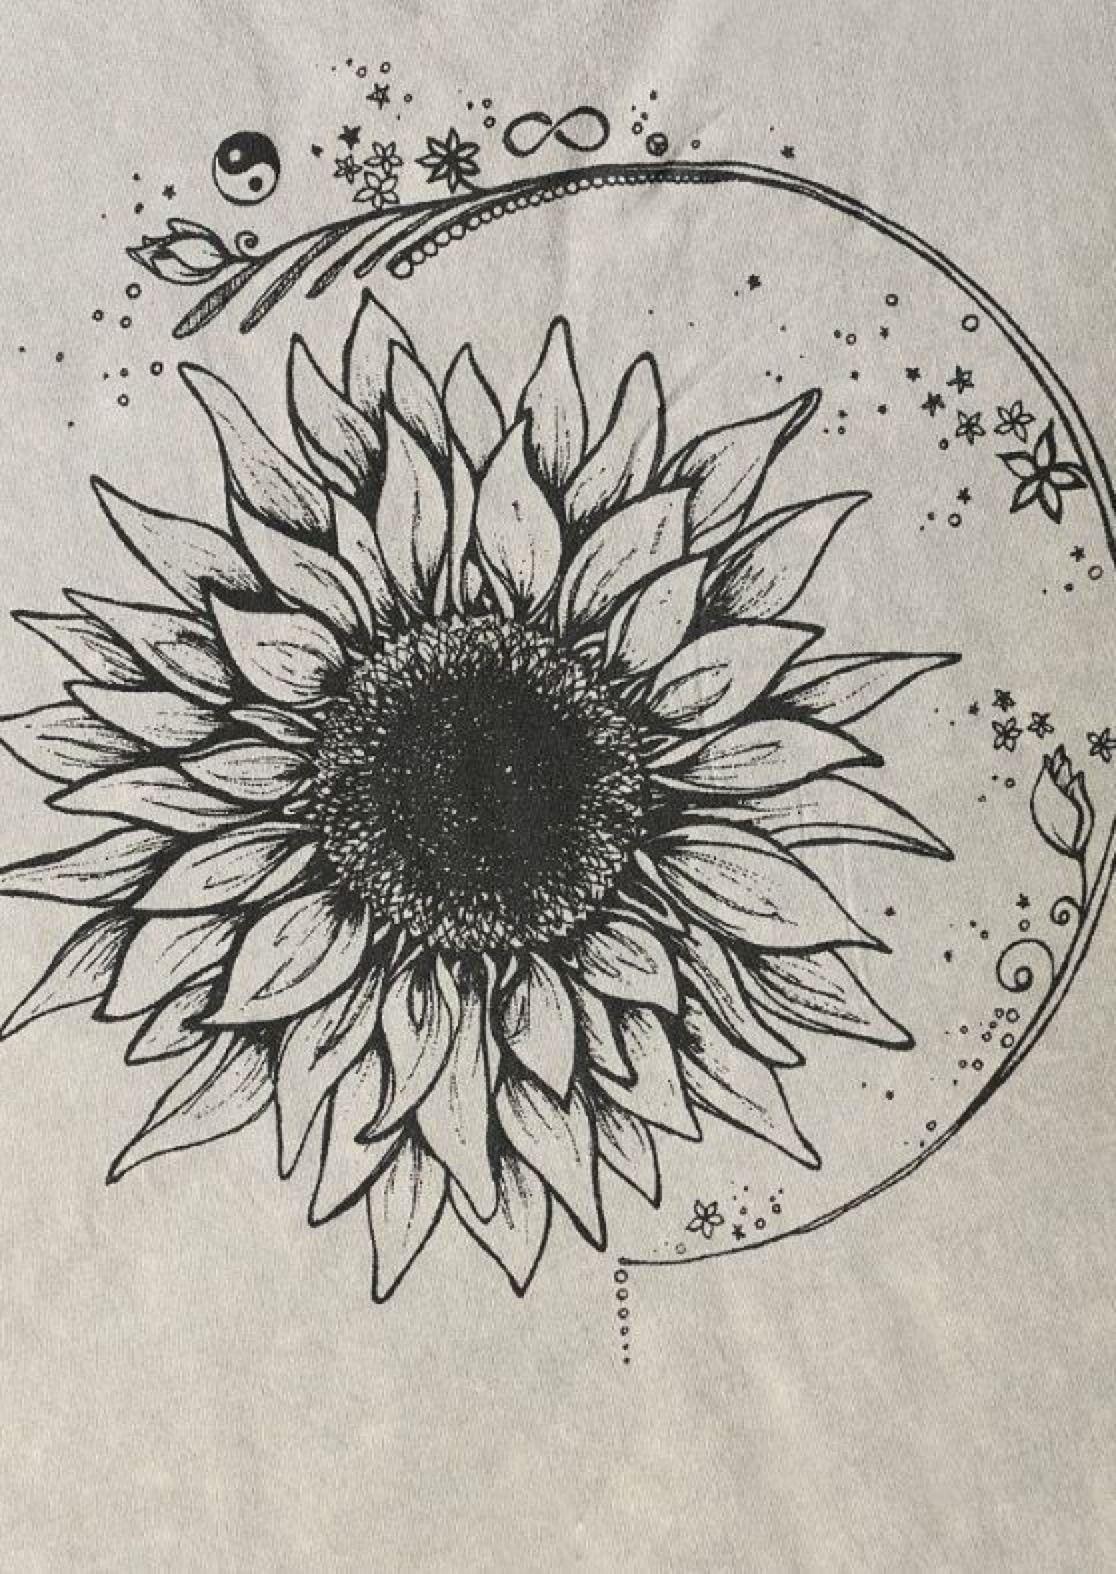 Sunflower Tattoo Tumblr : sunflower, tattoo, tumblr, Sunflower, Tattoo, Tumblr, Tattoo,, Sleeve,, Tattoos